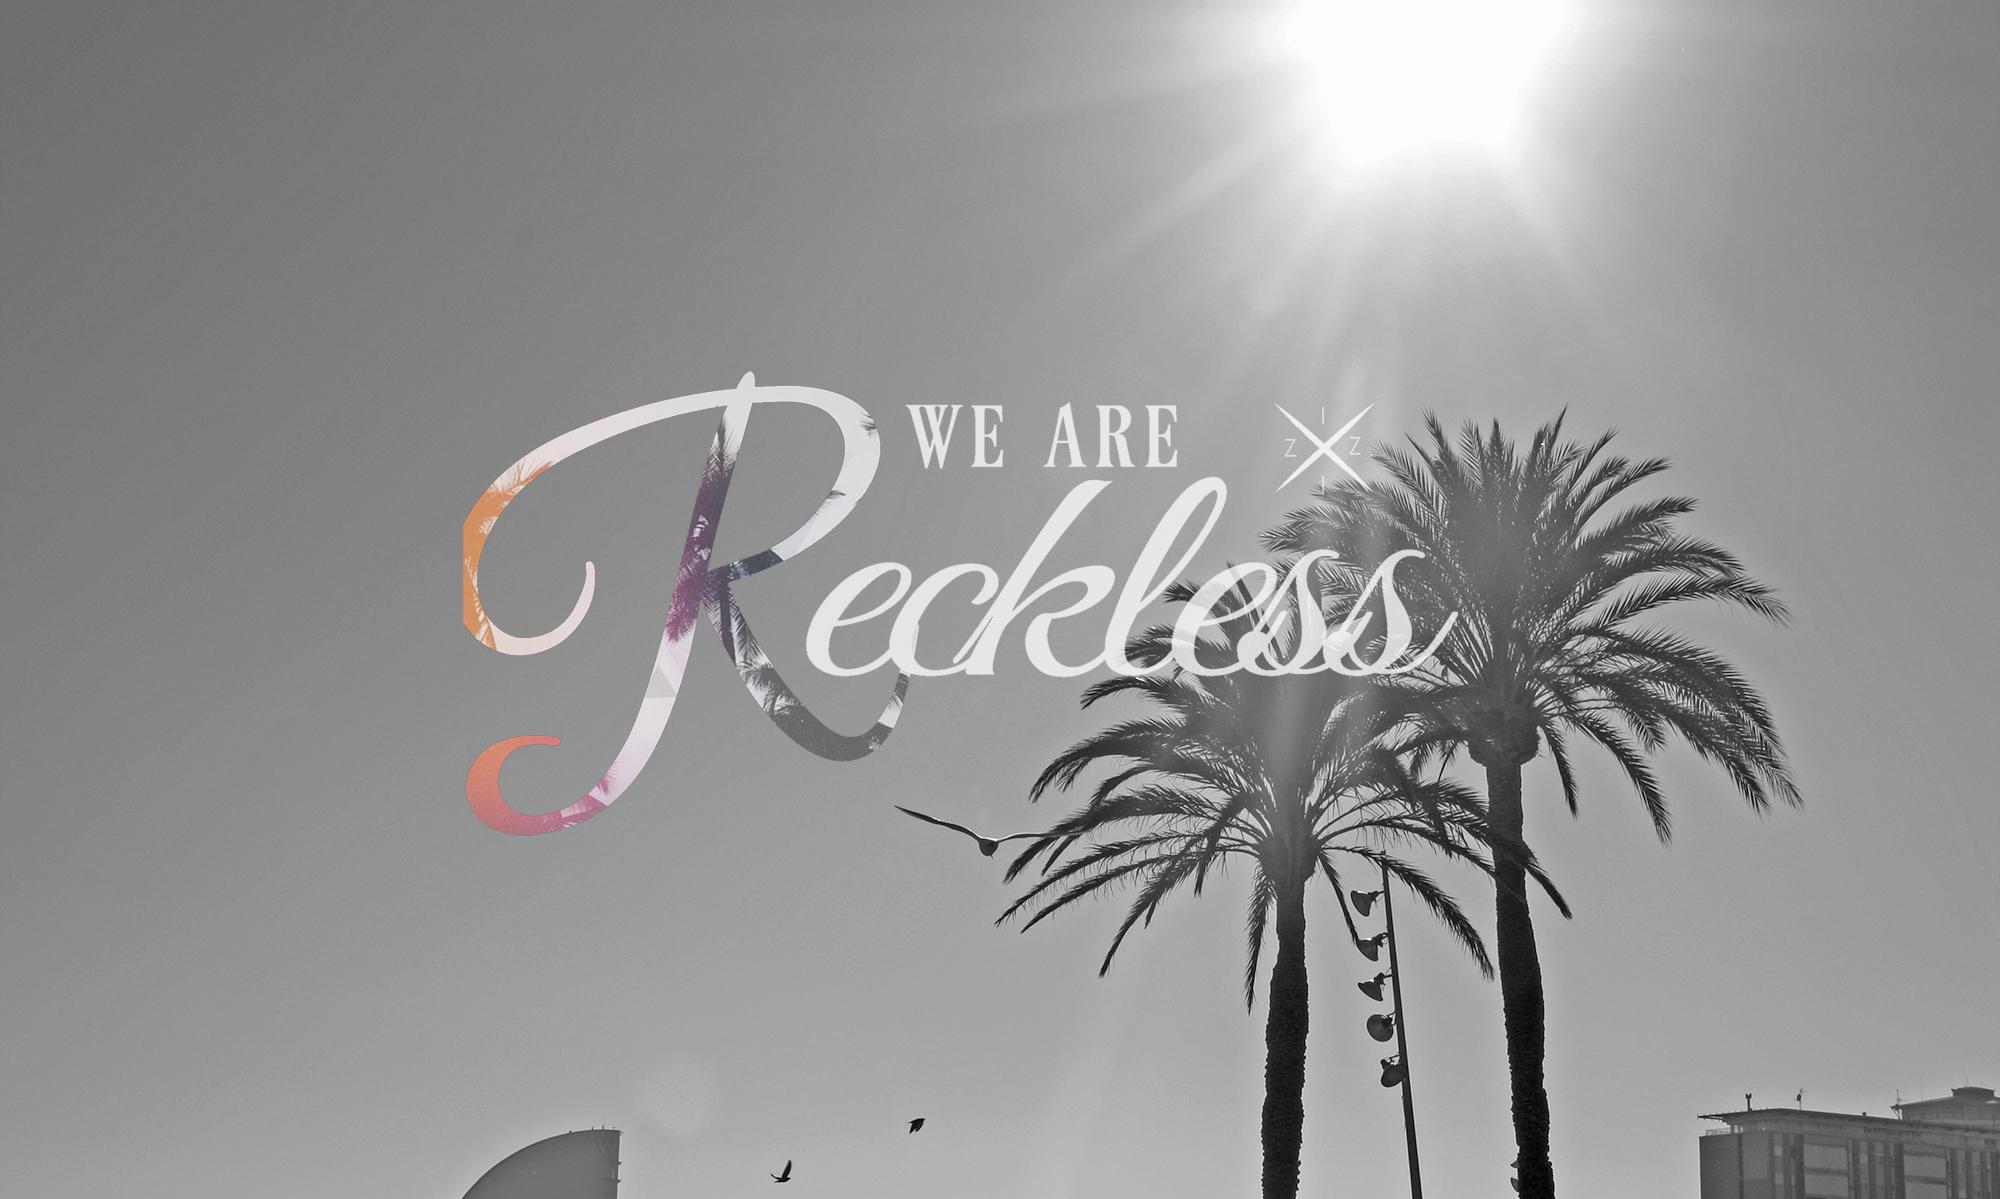 Reckless_Palm_fb